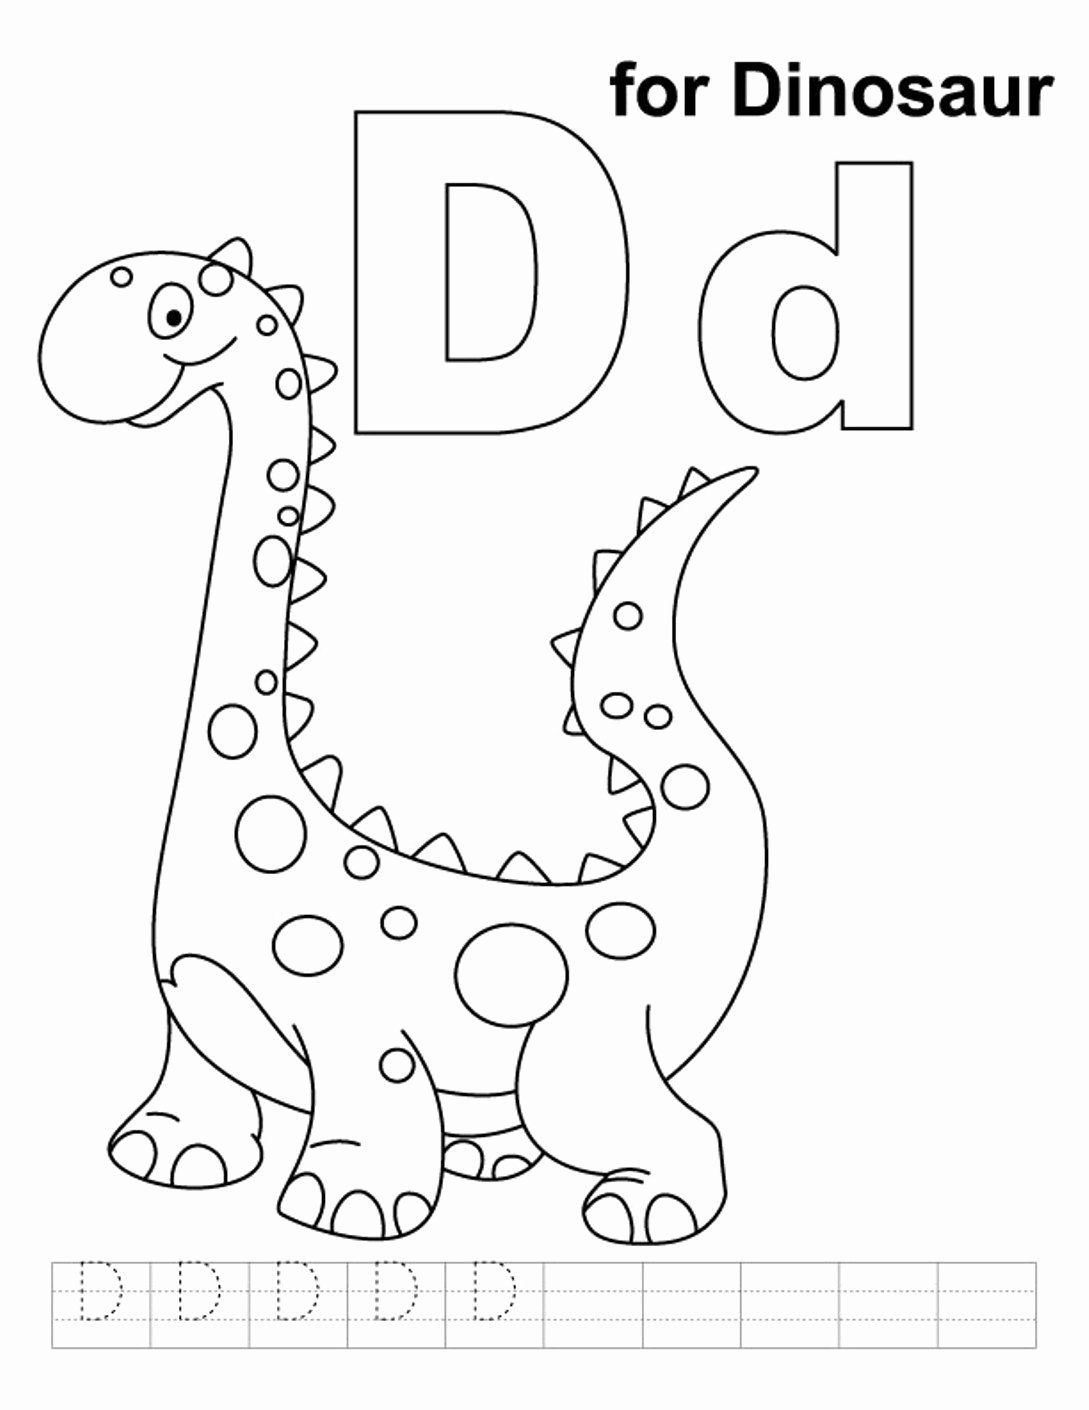 medium resolution of Alphabet Coloring Worksheets for 3 Year Olds Elegant Dinosaur Printable  Alphabet Coloring Pages – Color… in 2020   Dinosaur coloring pages